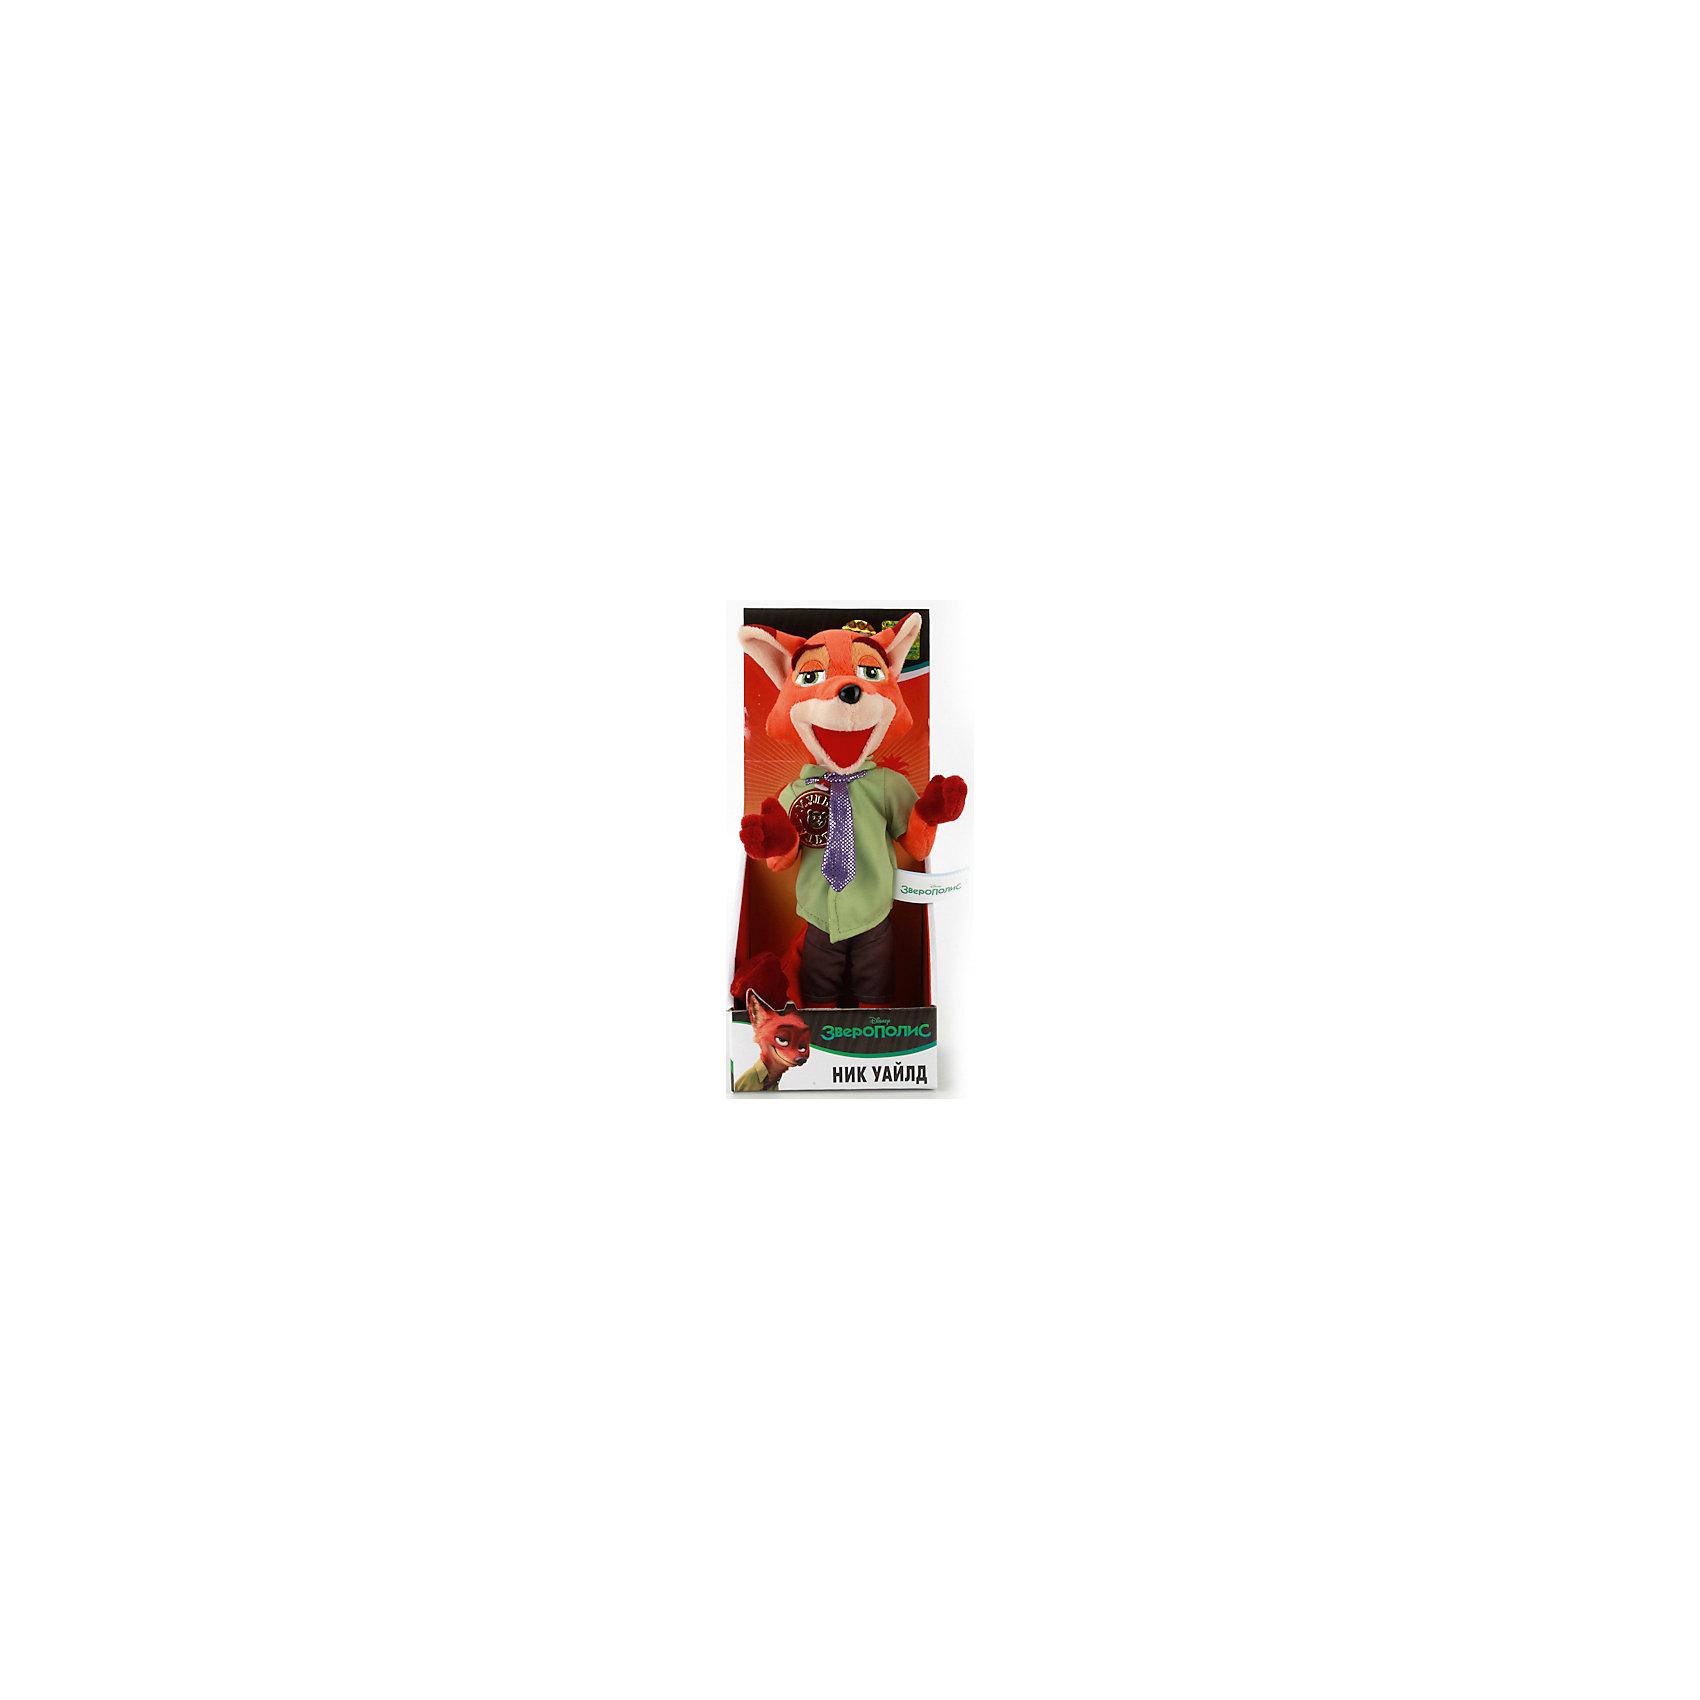 МУЛЬТИ-ПУЛЬТИ Мягкая игрушка Ник Уайлд, 25см, Зверополис, МУЛЬТИ-ПУЛЬТИ мульти пульти мягкая игрушка крокодильчик свомпи where is my water со звуком 20 см мульти пульти